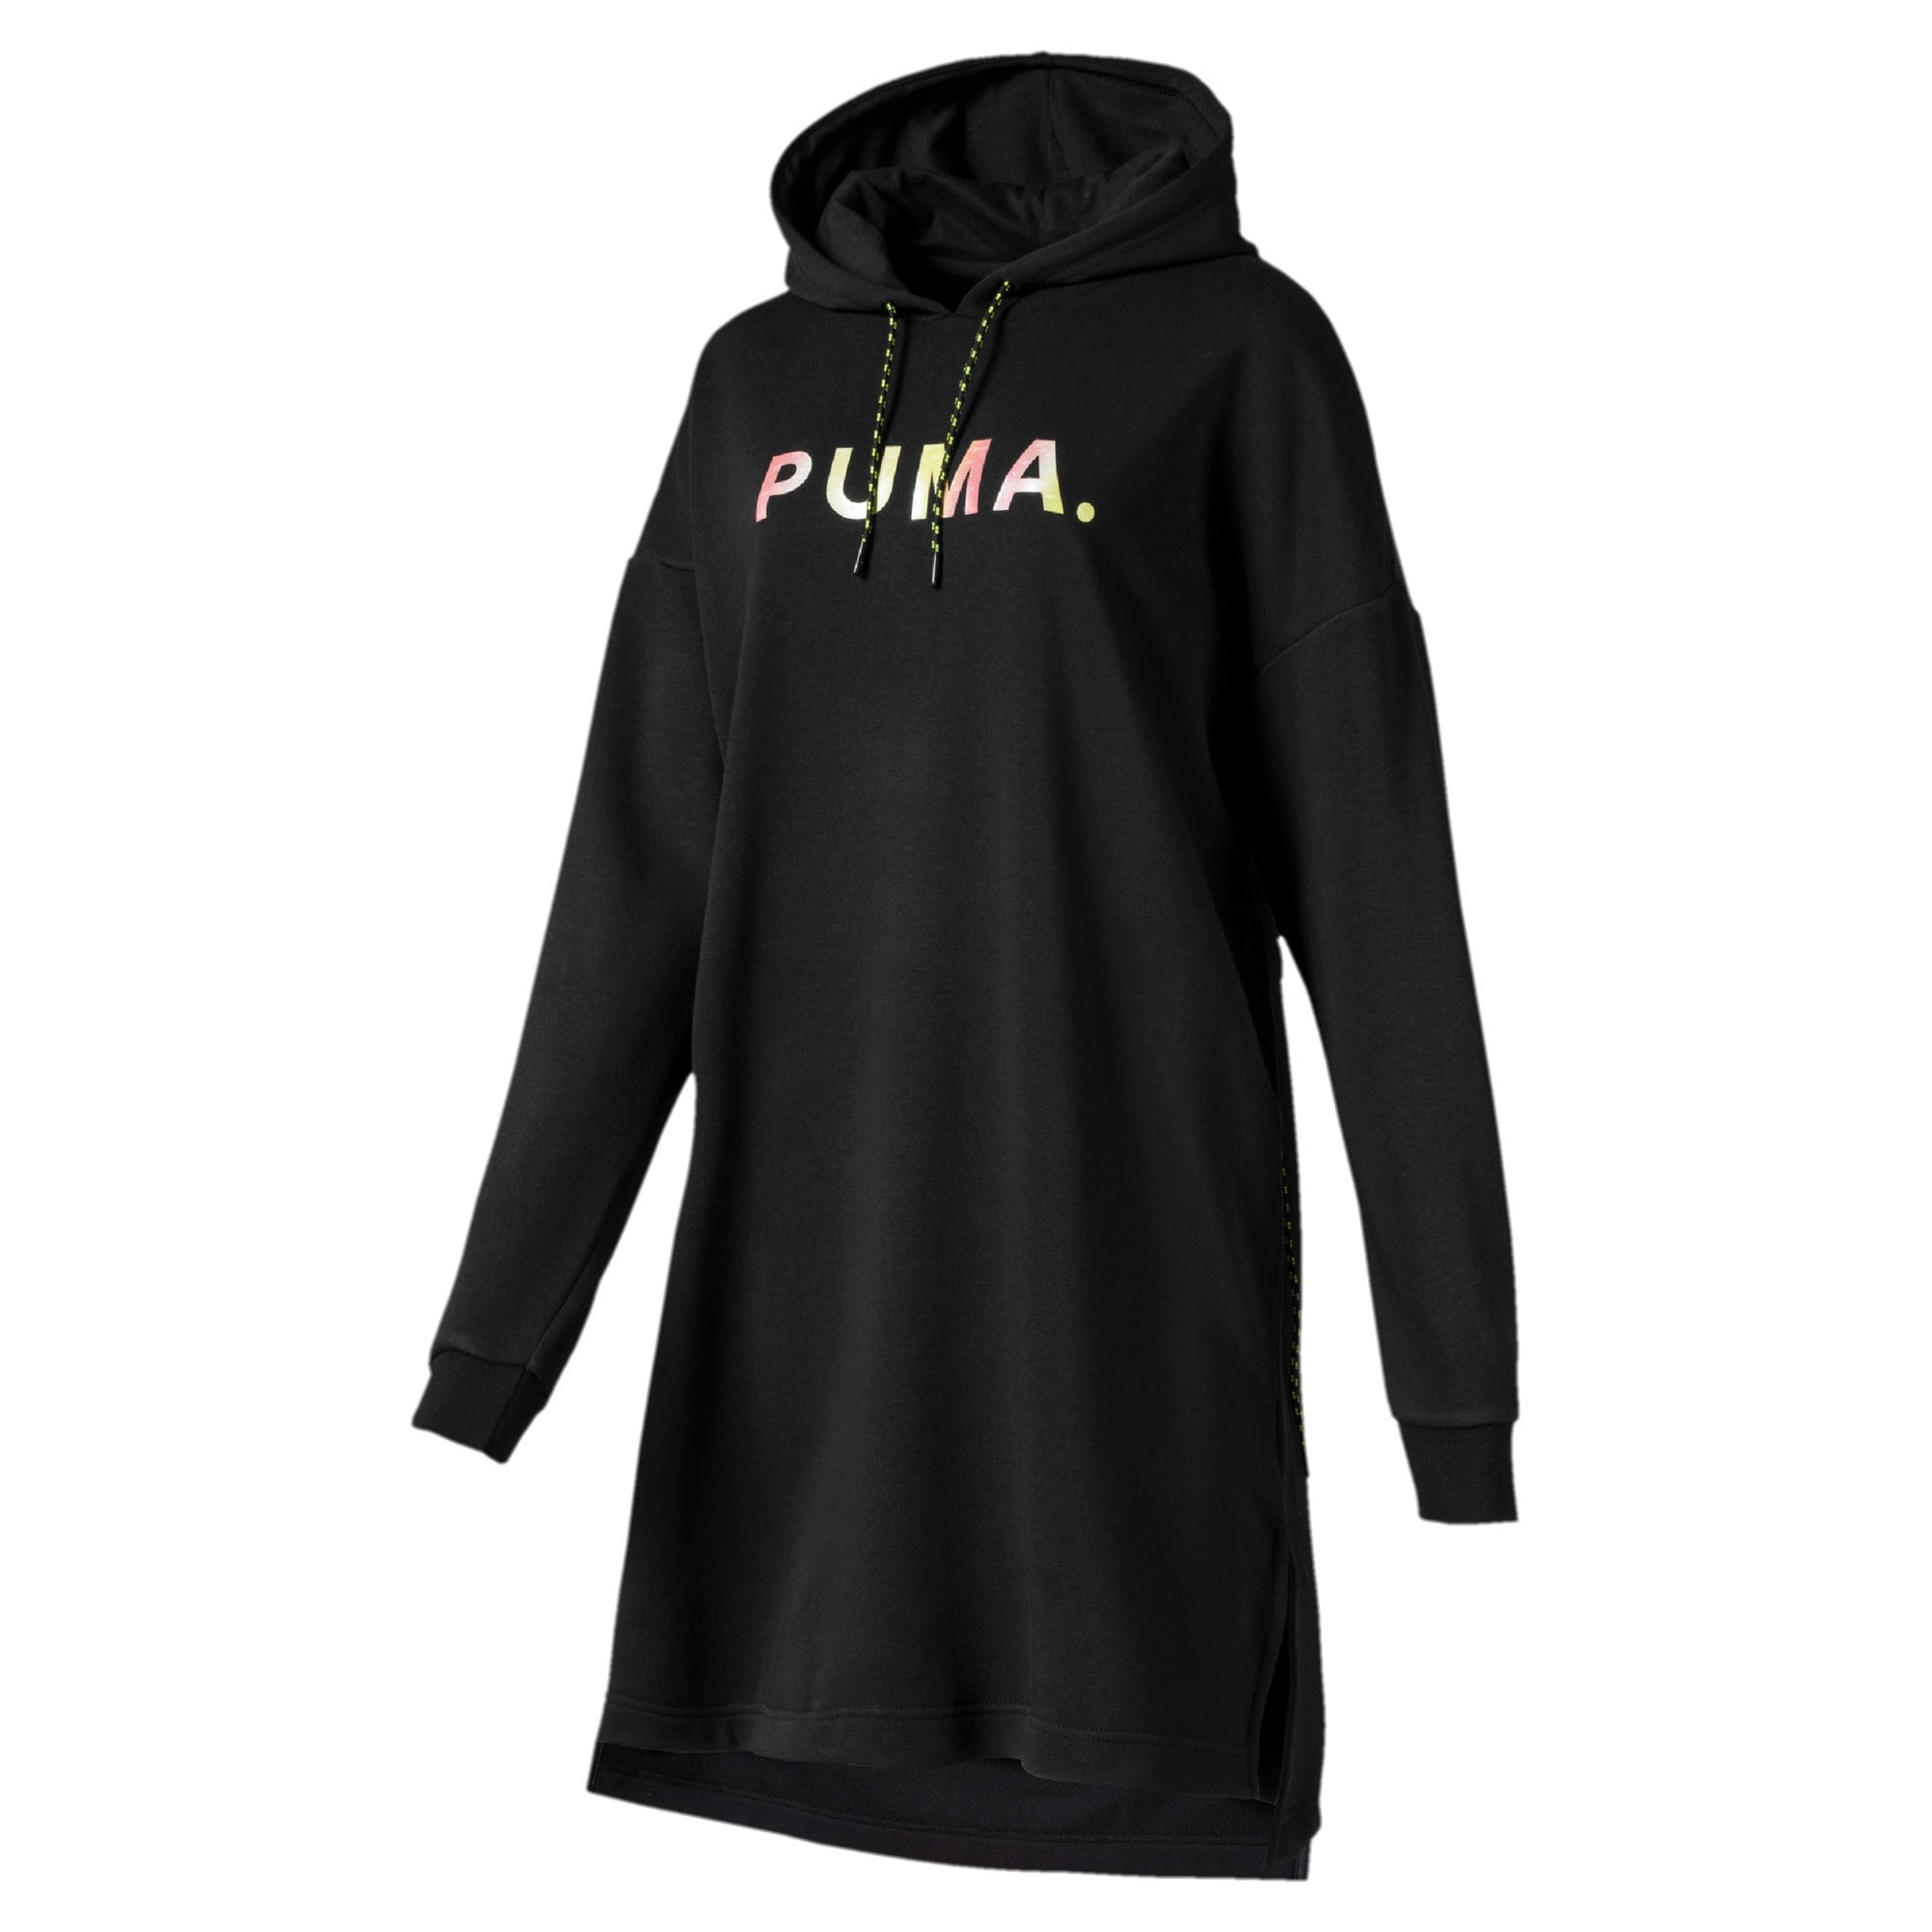 Thumbnail 4 of Chase Hooded Women's Dress, Puma Black, medium